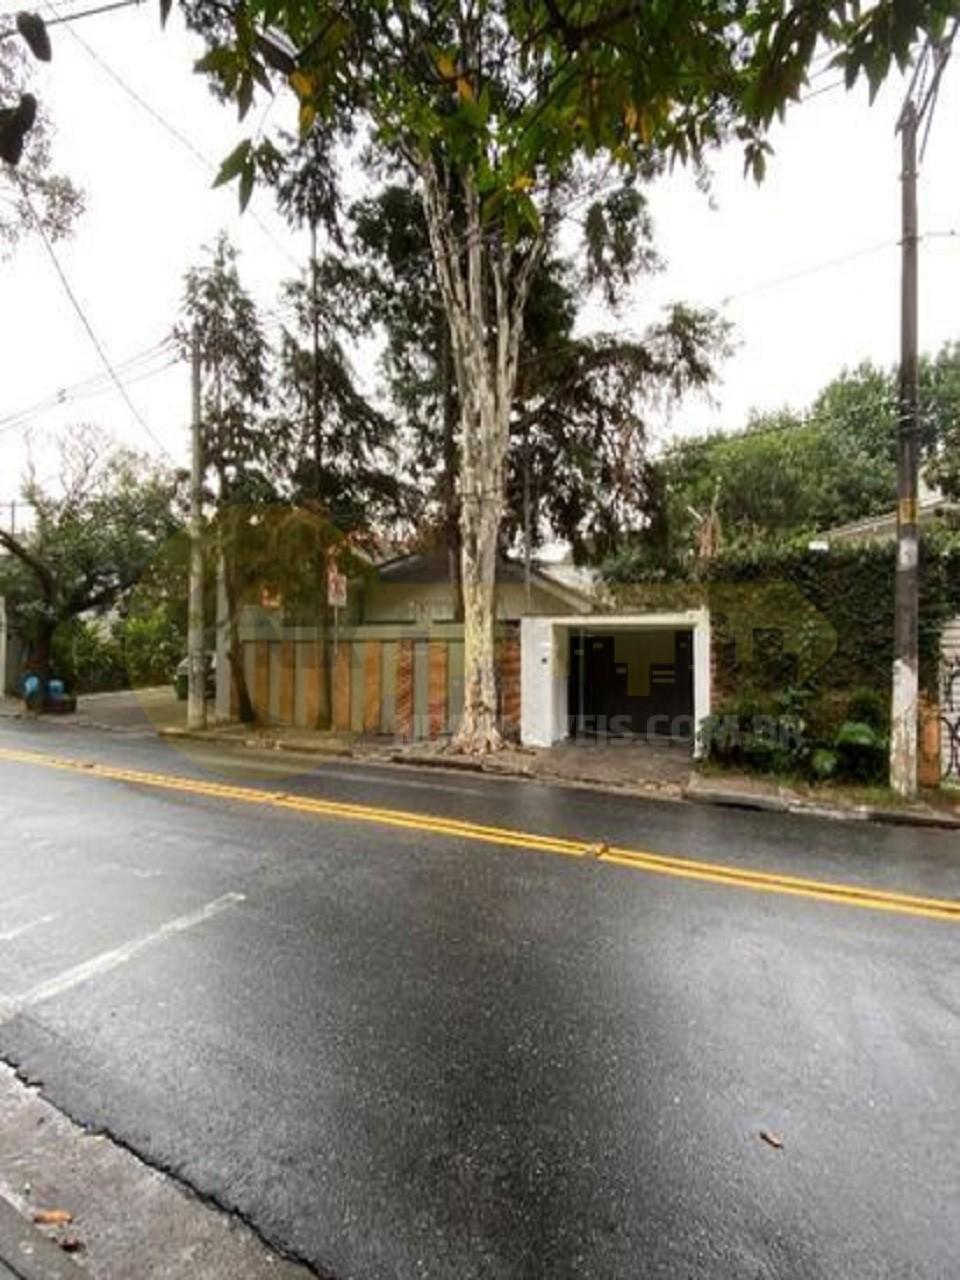 alugar casa fradique coutinho perto do metro